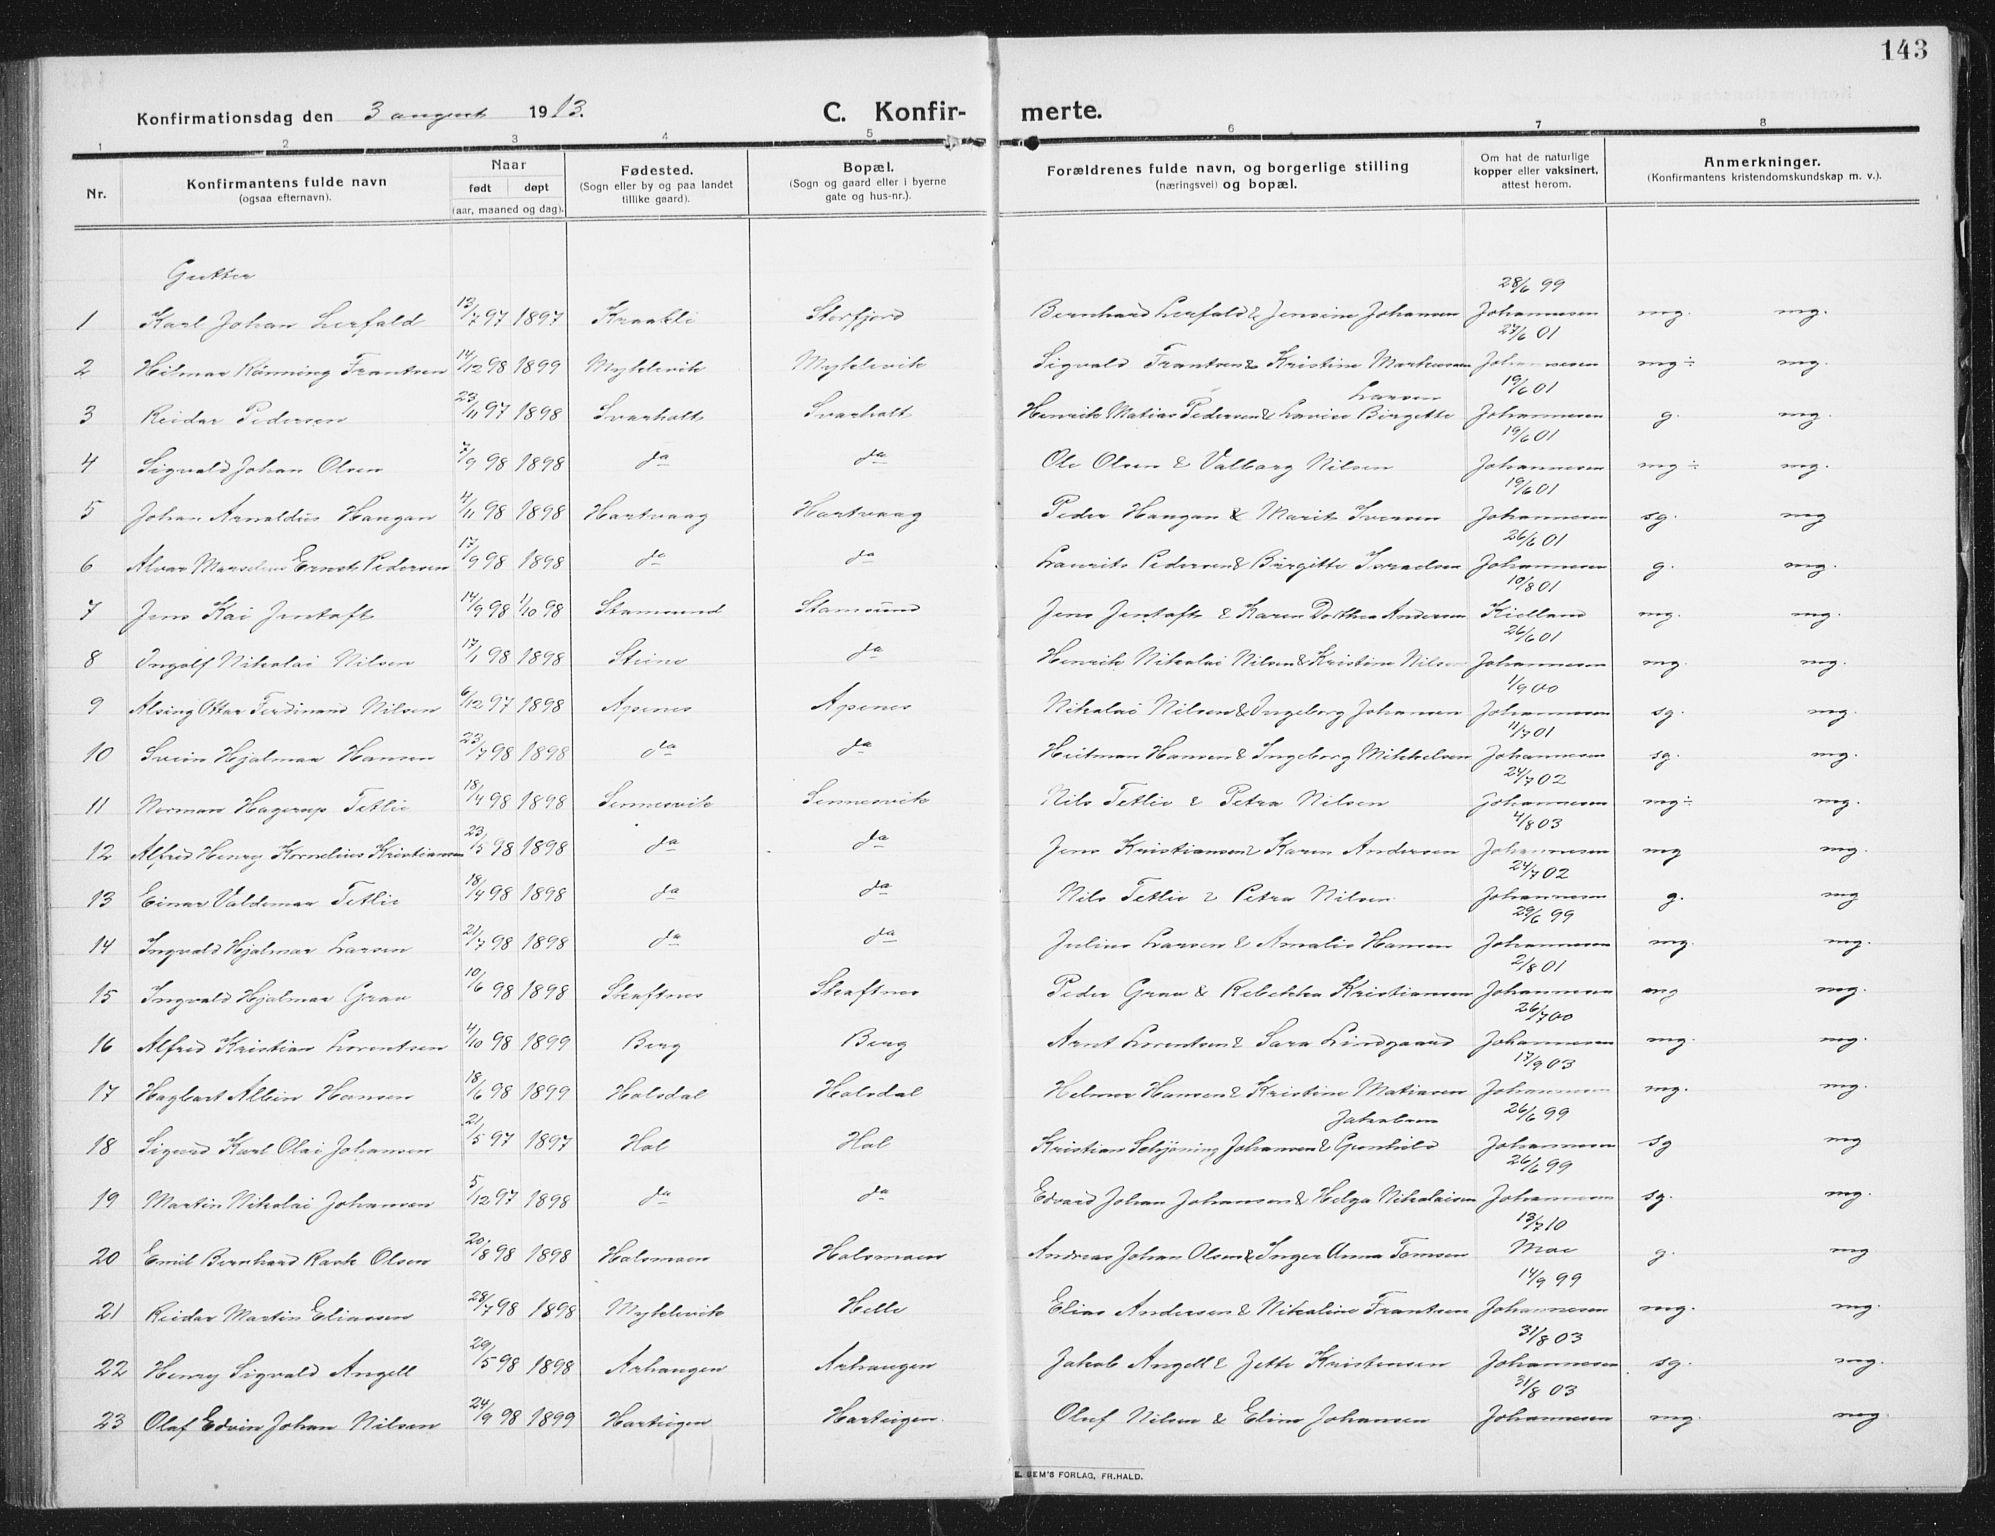 SAT, Ministerialprotokoller, klokkerbøker og fødselsregistre - Nordland, 882/L1183: Klokkerbok nr. 882C01, 1911-1938, s. 143